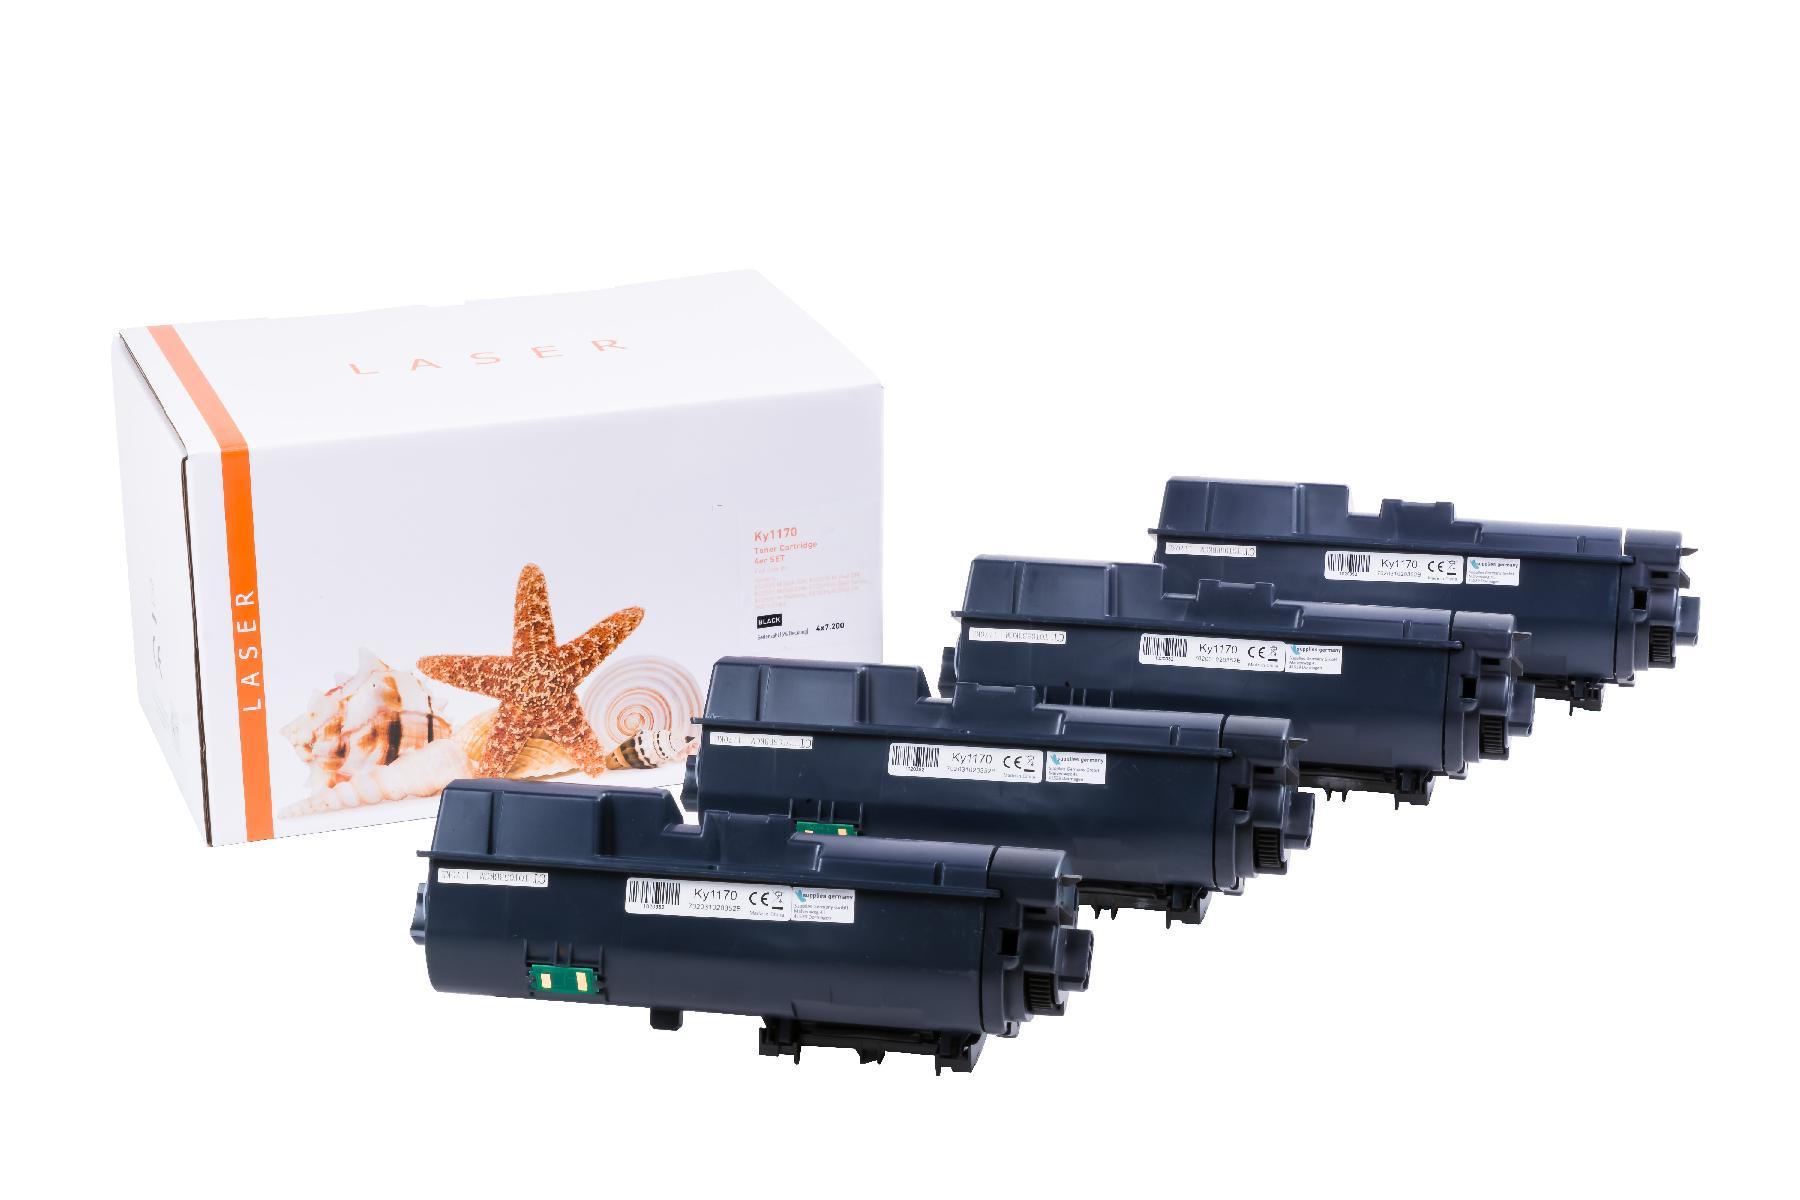 4er Set TONTK1170 Alternativ Toner Black für Kyoce / TK1170 / 4x7.200 Seiten